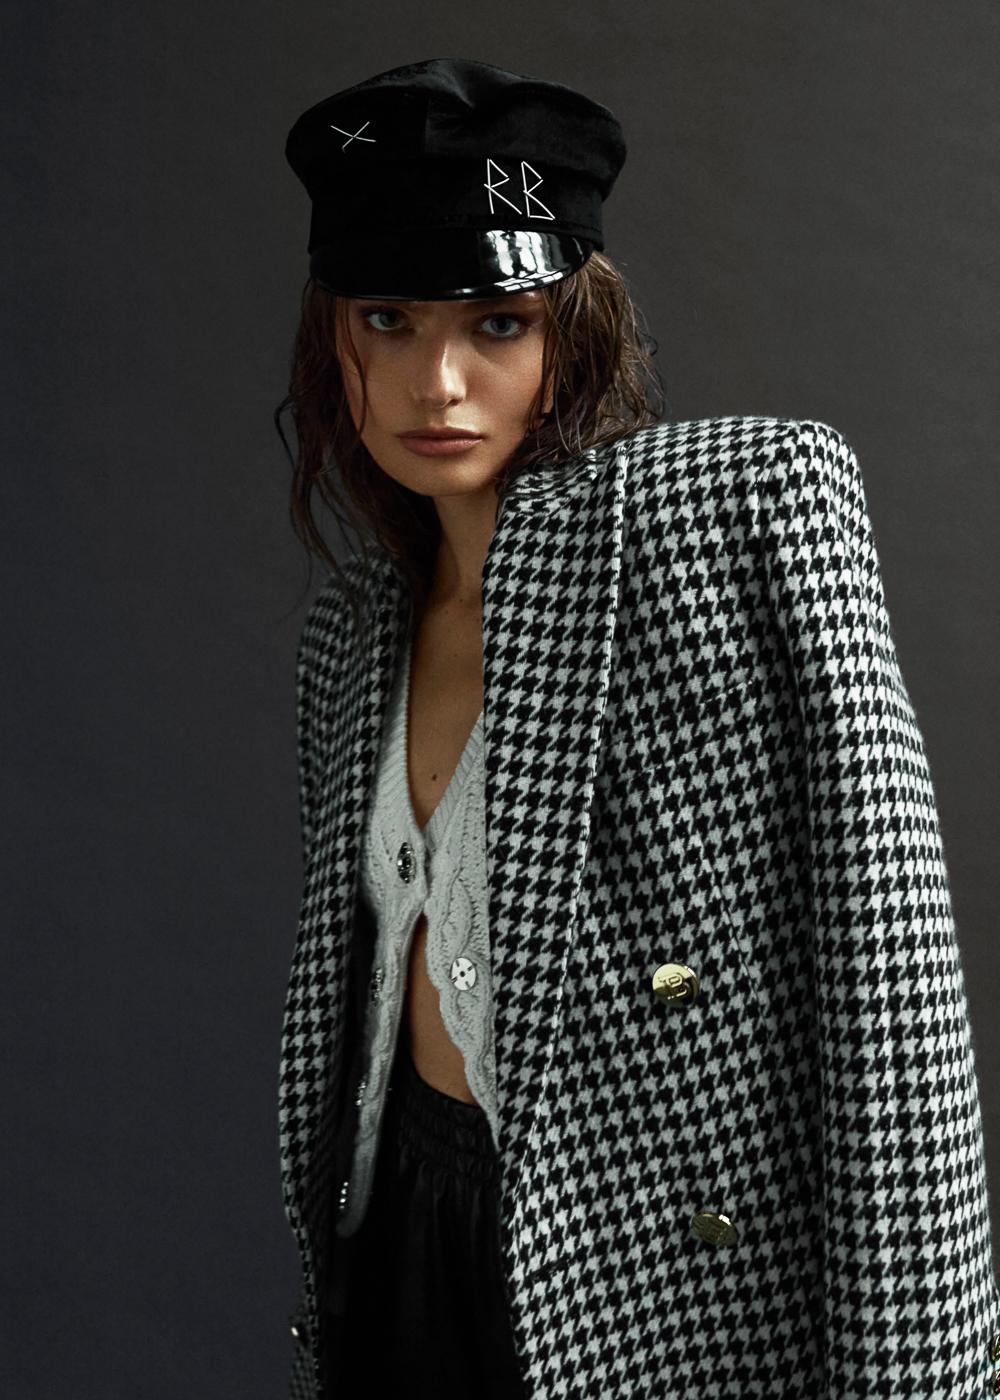 Anna Mila Guyenz by Per Florian Appelgren for Elle Croatia January 2021